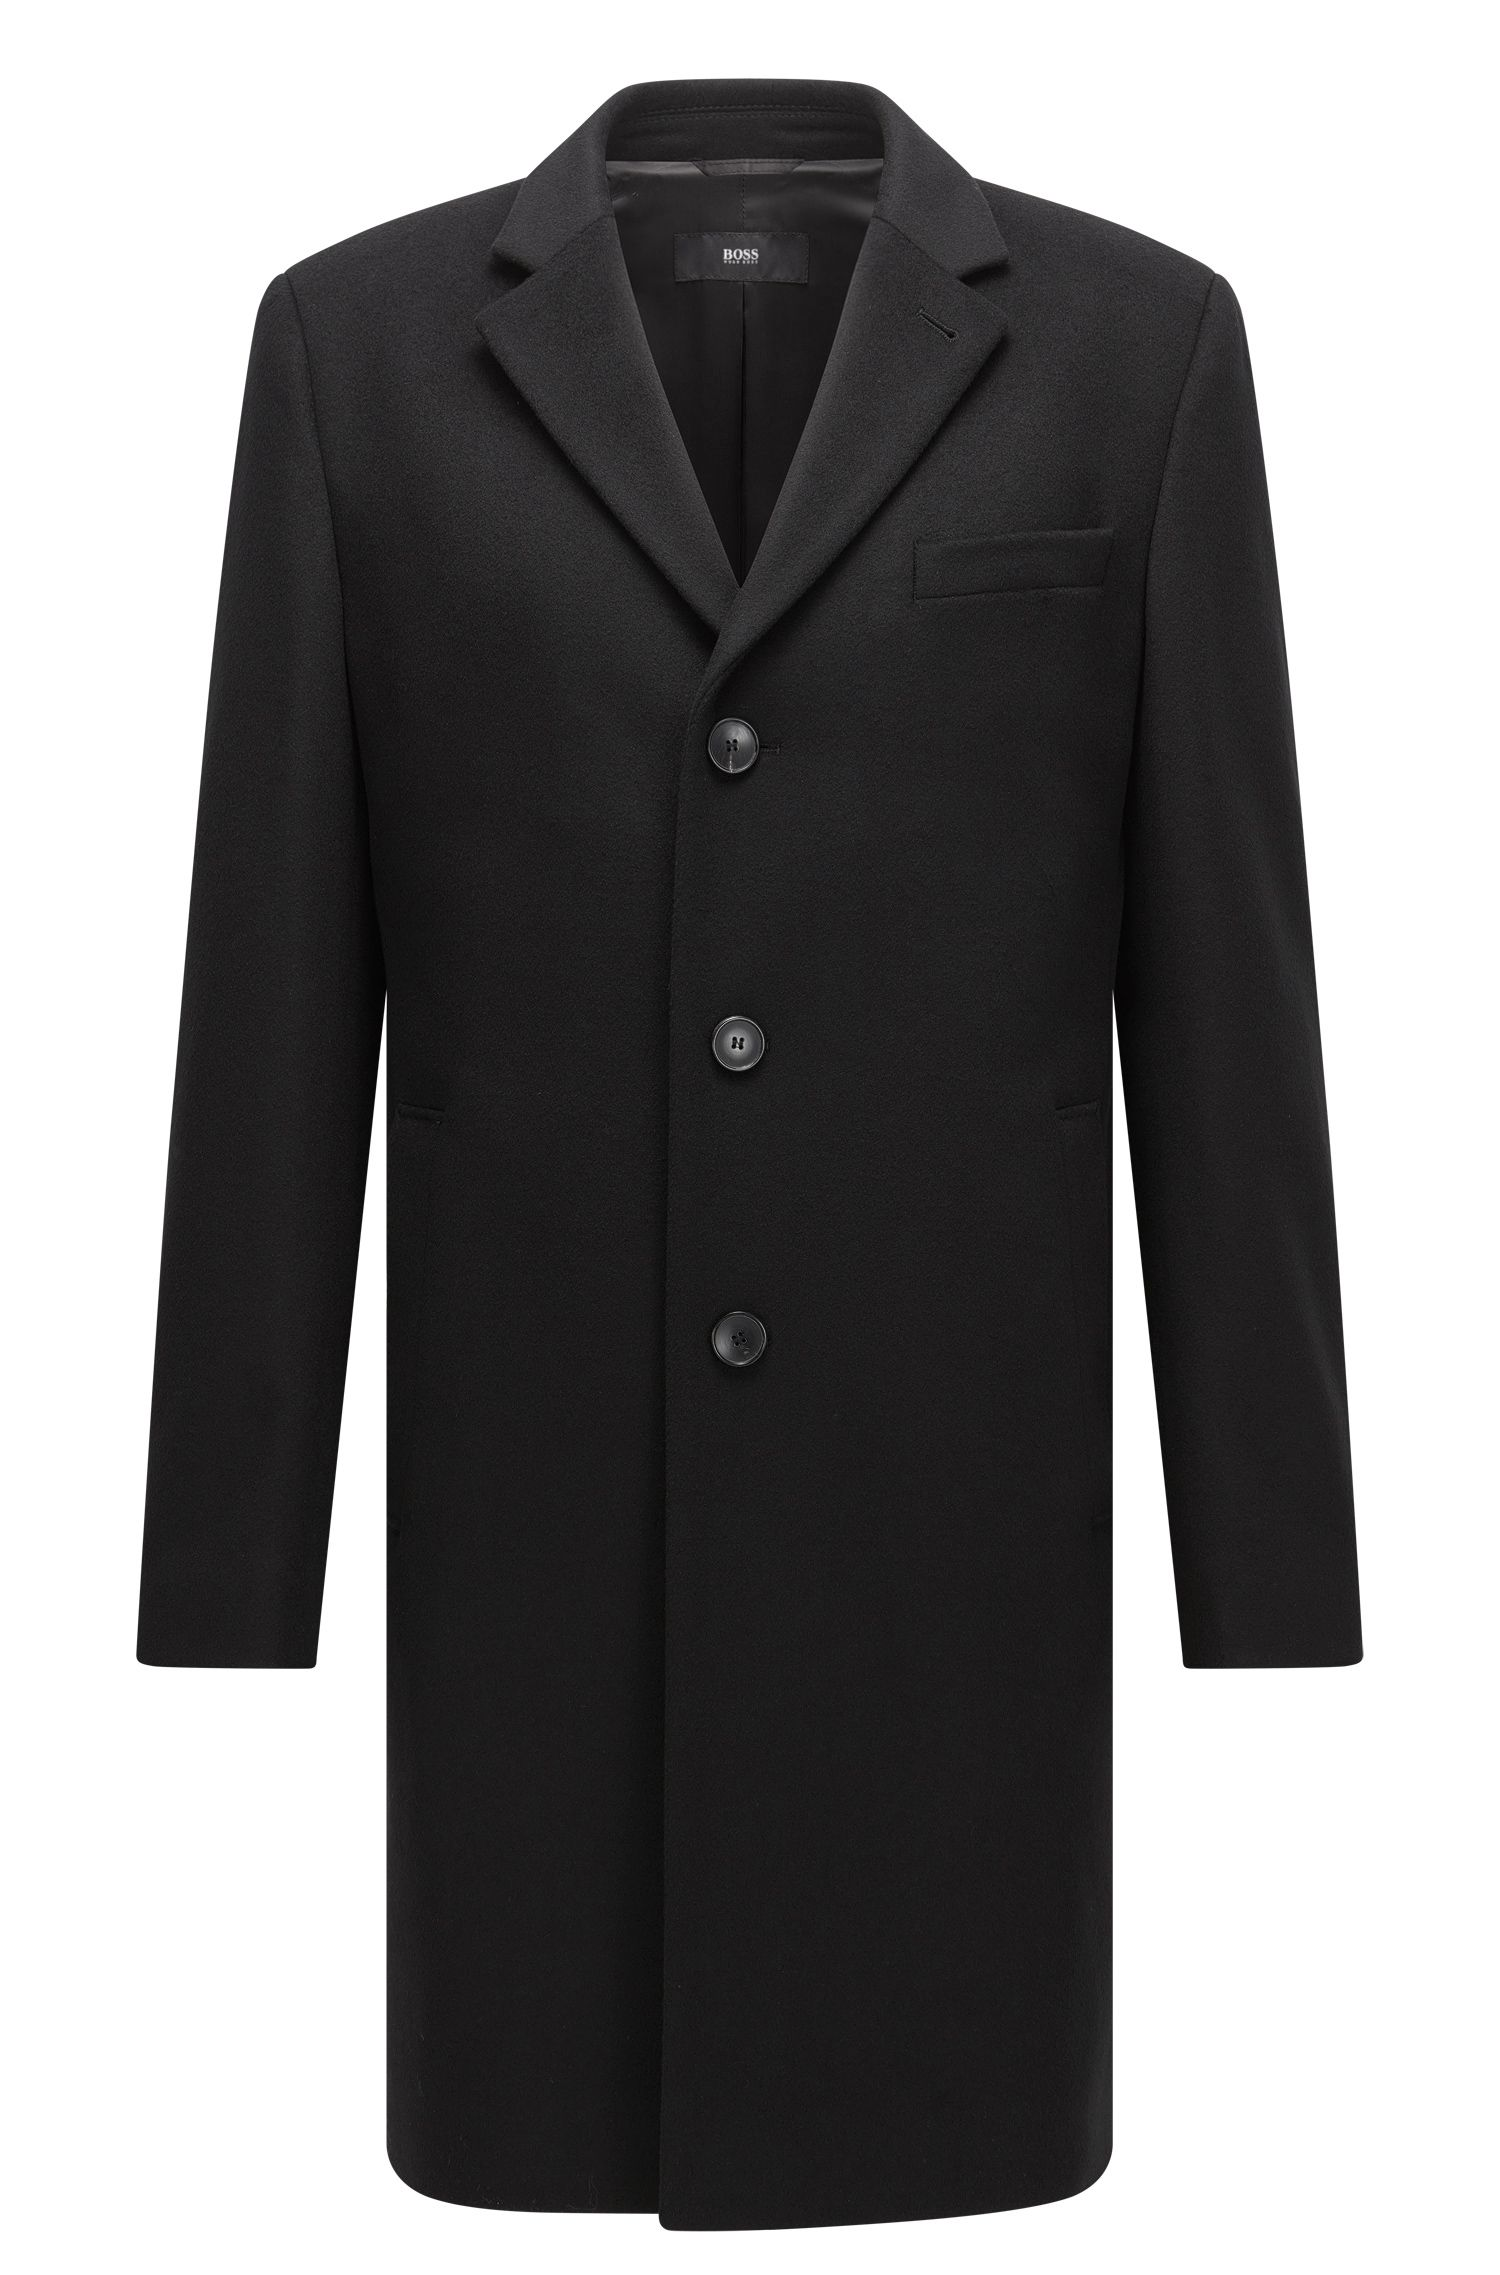 Wool Cashmere Top Coat | Nye